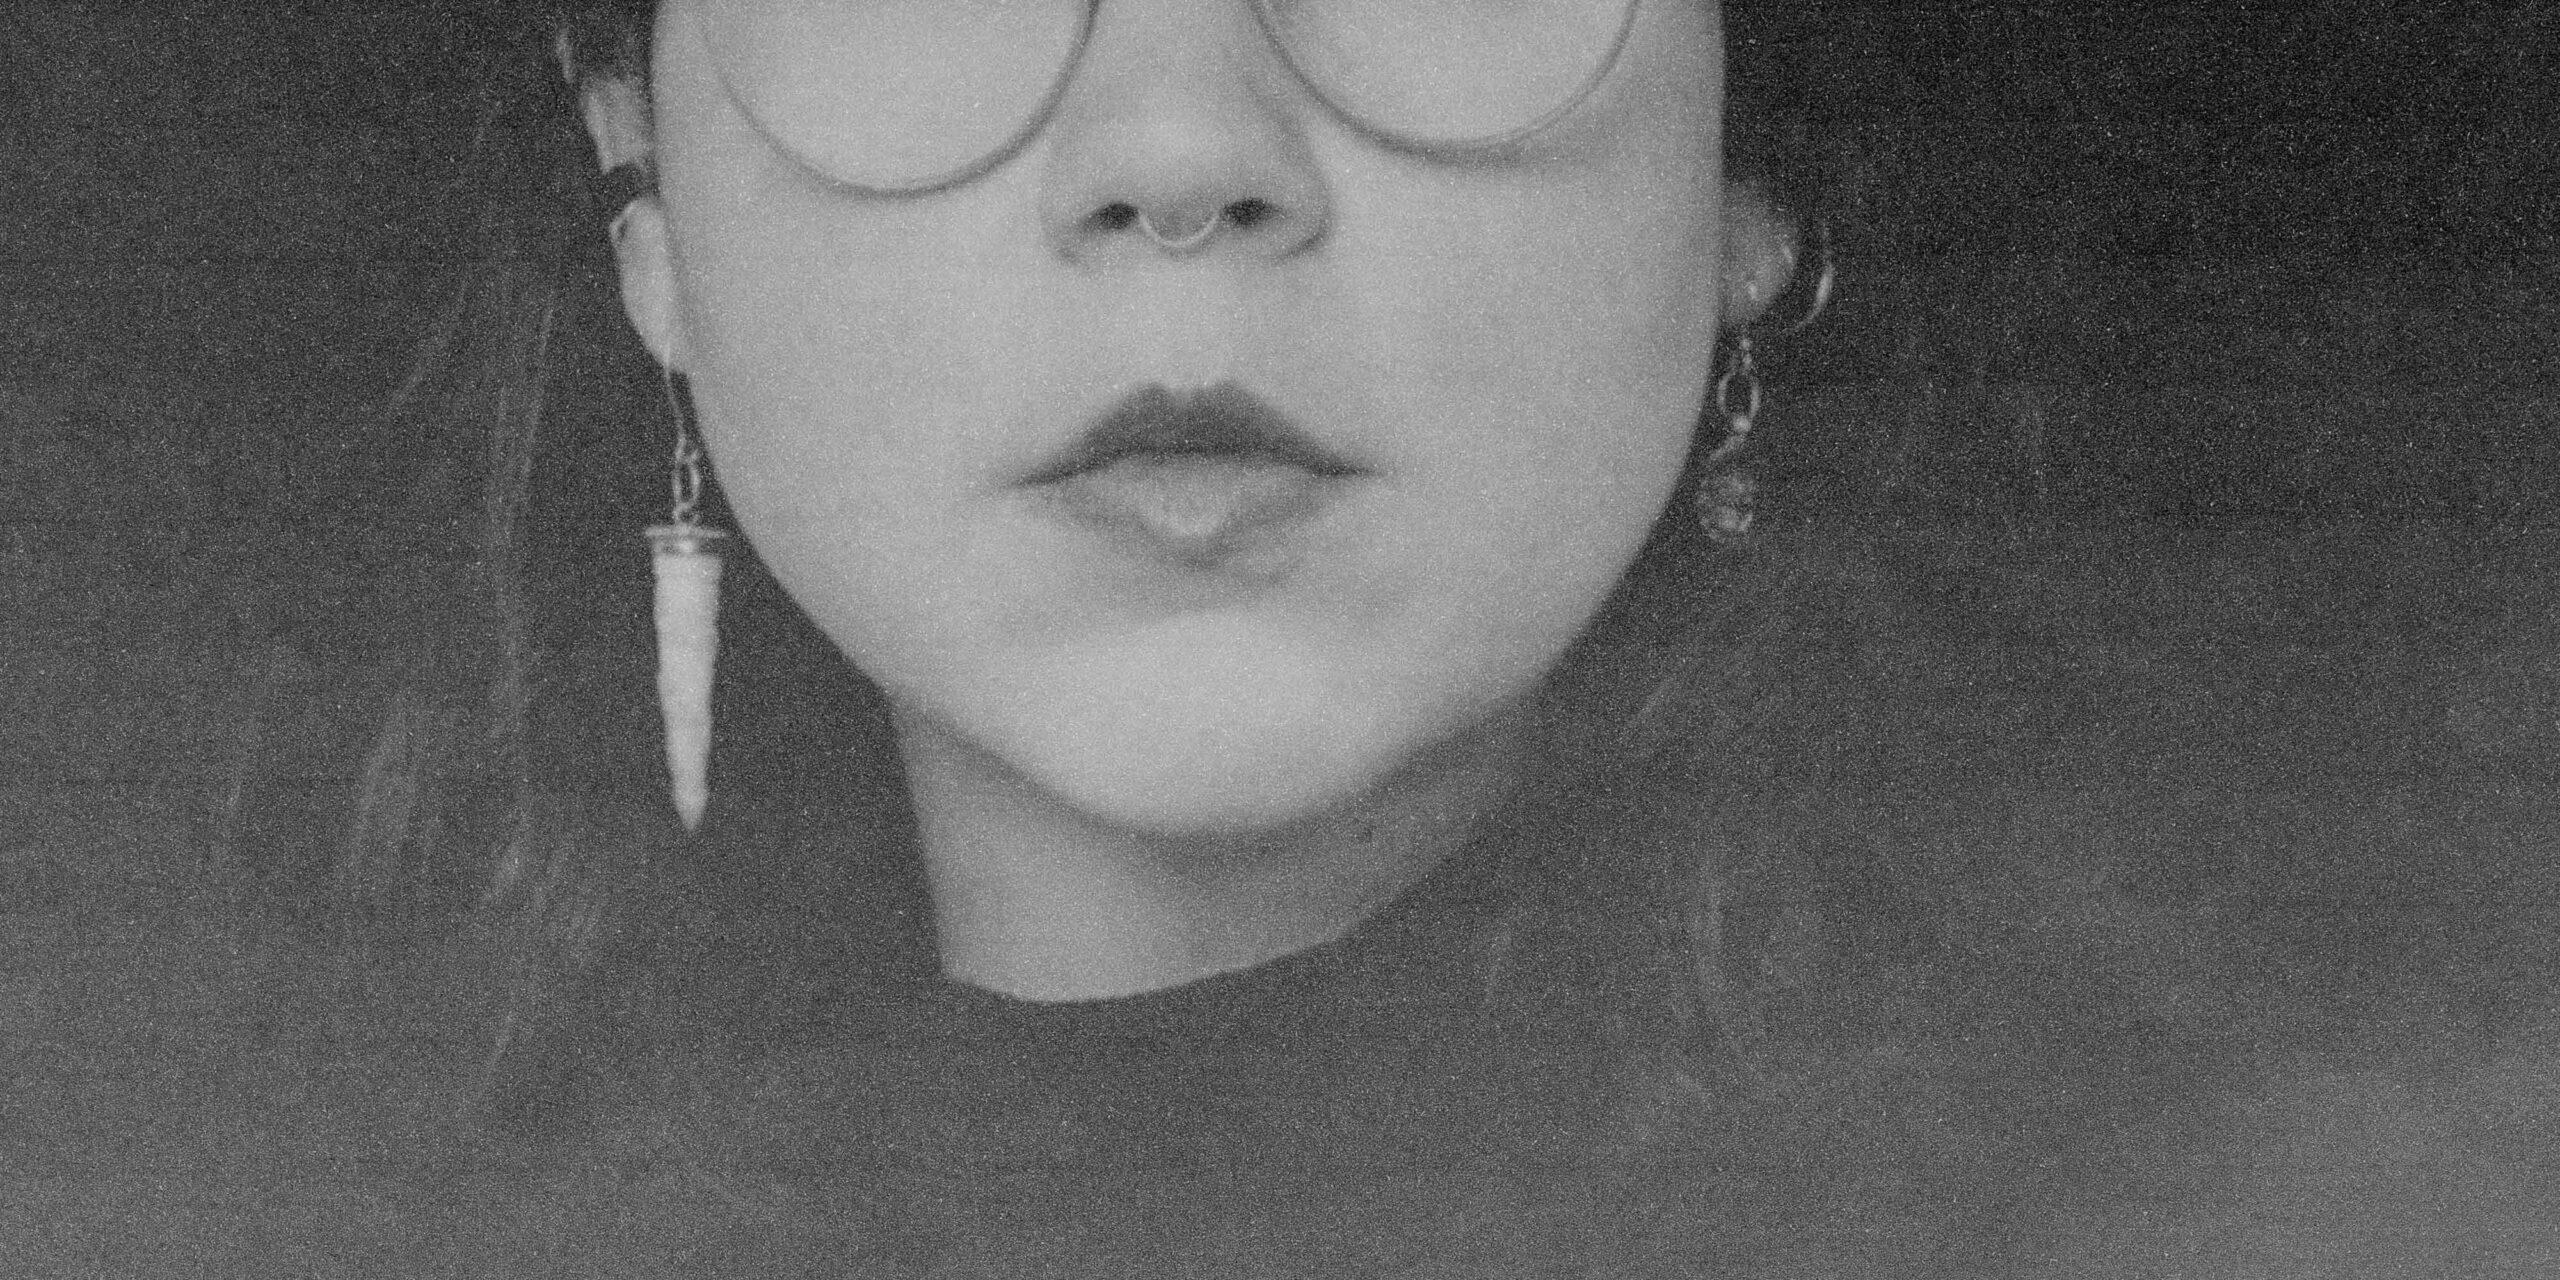 01-Portrait02b